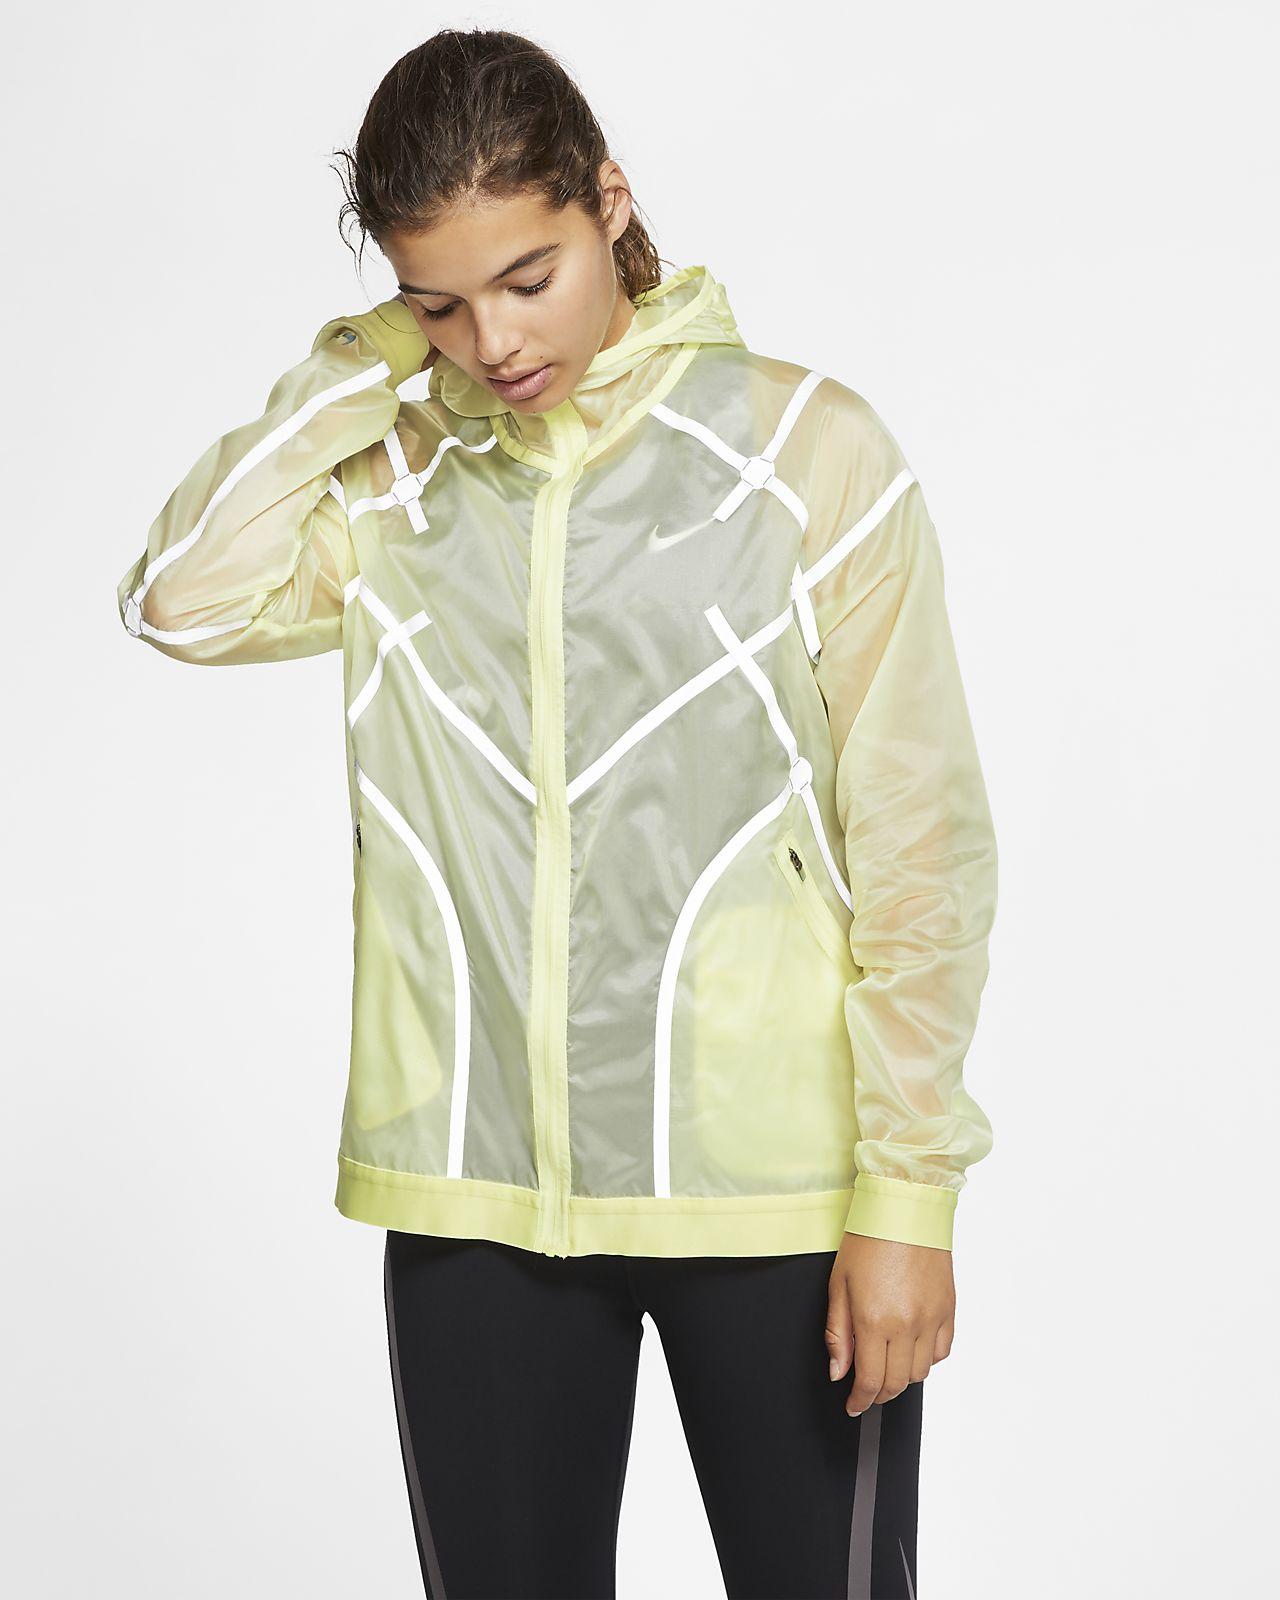 Chamarra de running con capucha para mujer Nike City Ready